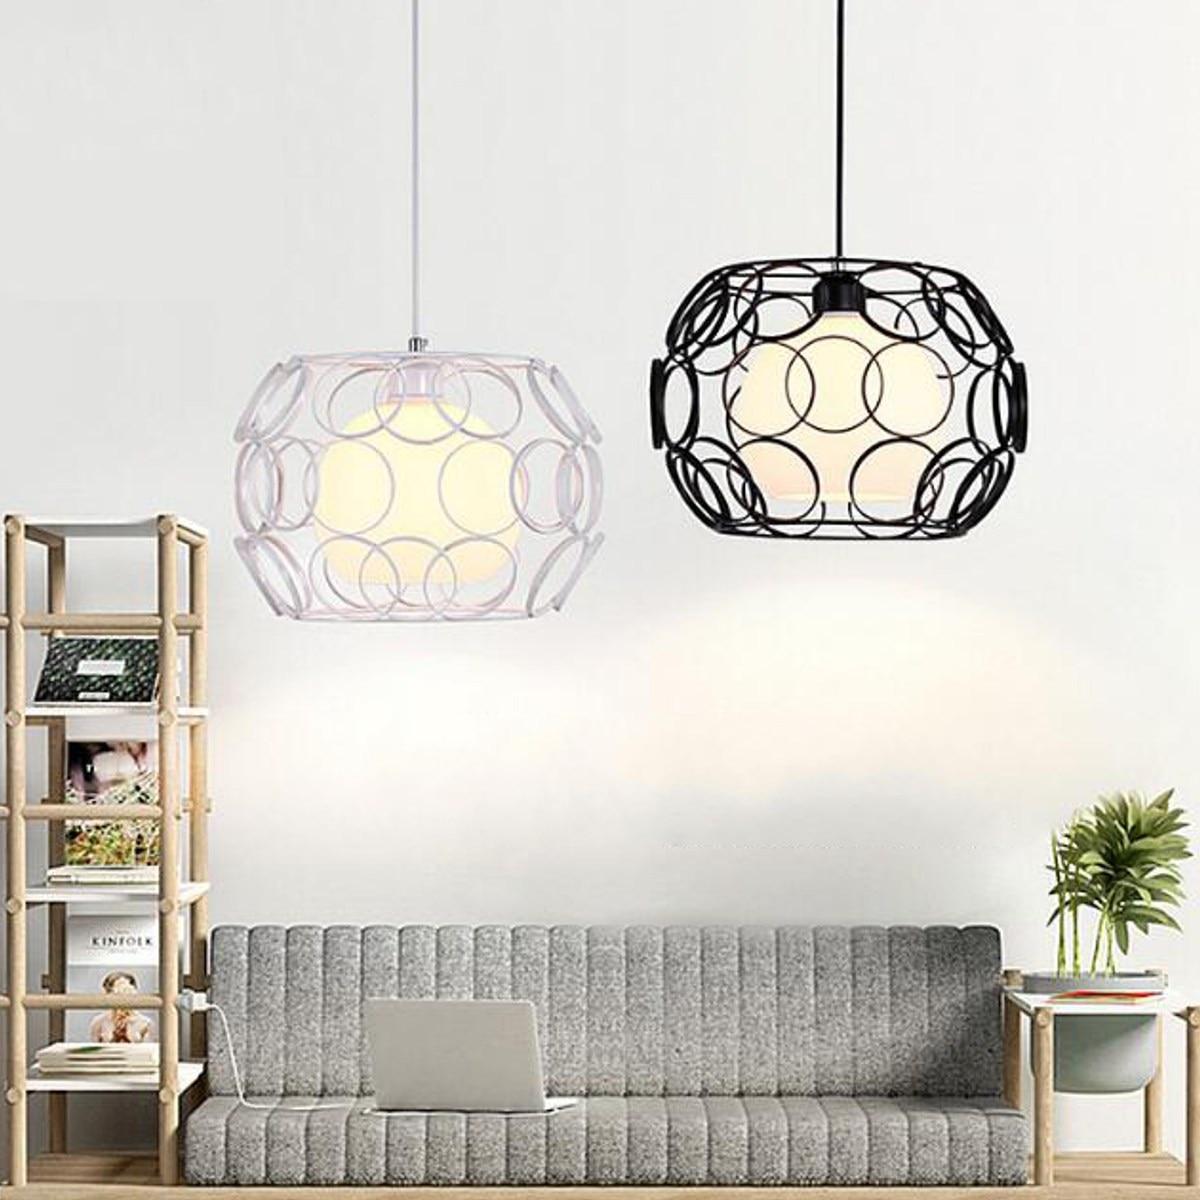 Personality Edison Bulb Pendant Lamps Restaurant Bar Cafe Lamps Rattan Field Pasta Ball E27 LED Pendant Light набор для кухни pasta grande 1126804